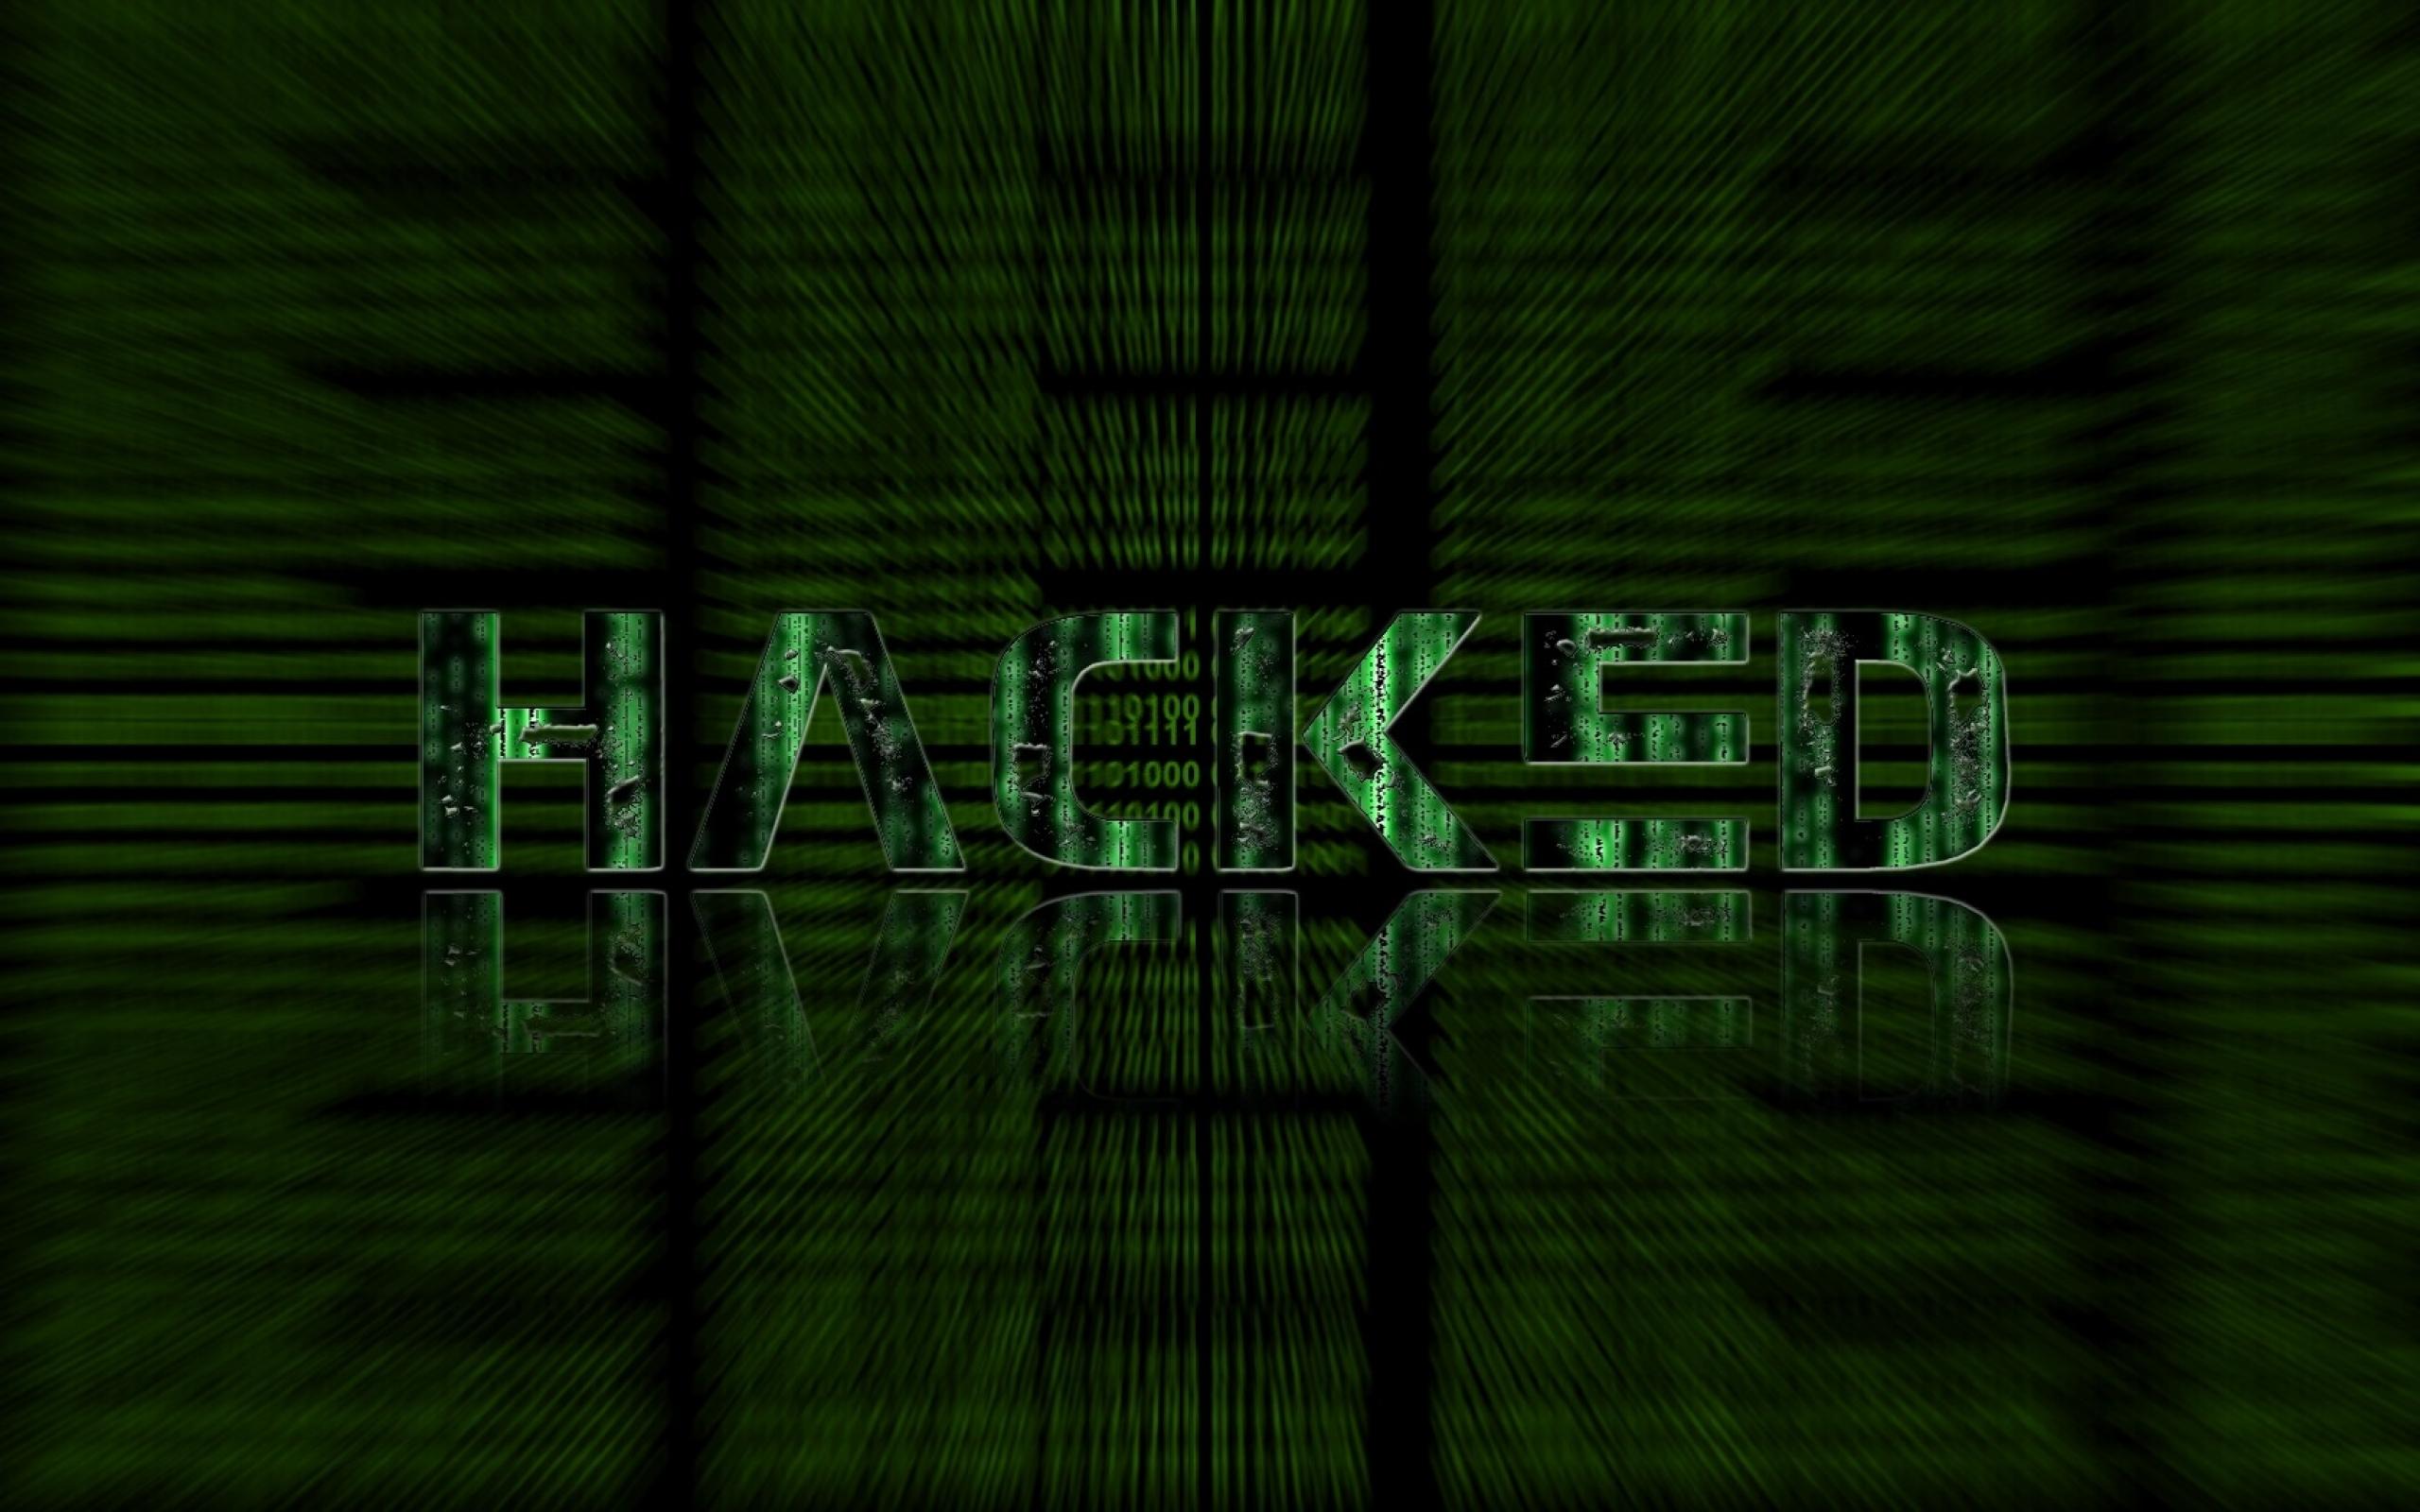 Wallpapers Download 2560x1600 hacking hackers 3d 1680x1050 wallpaper 2560x1600